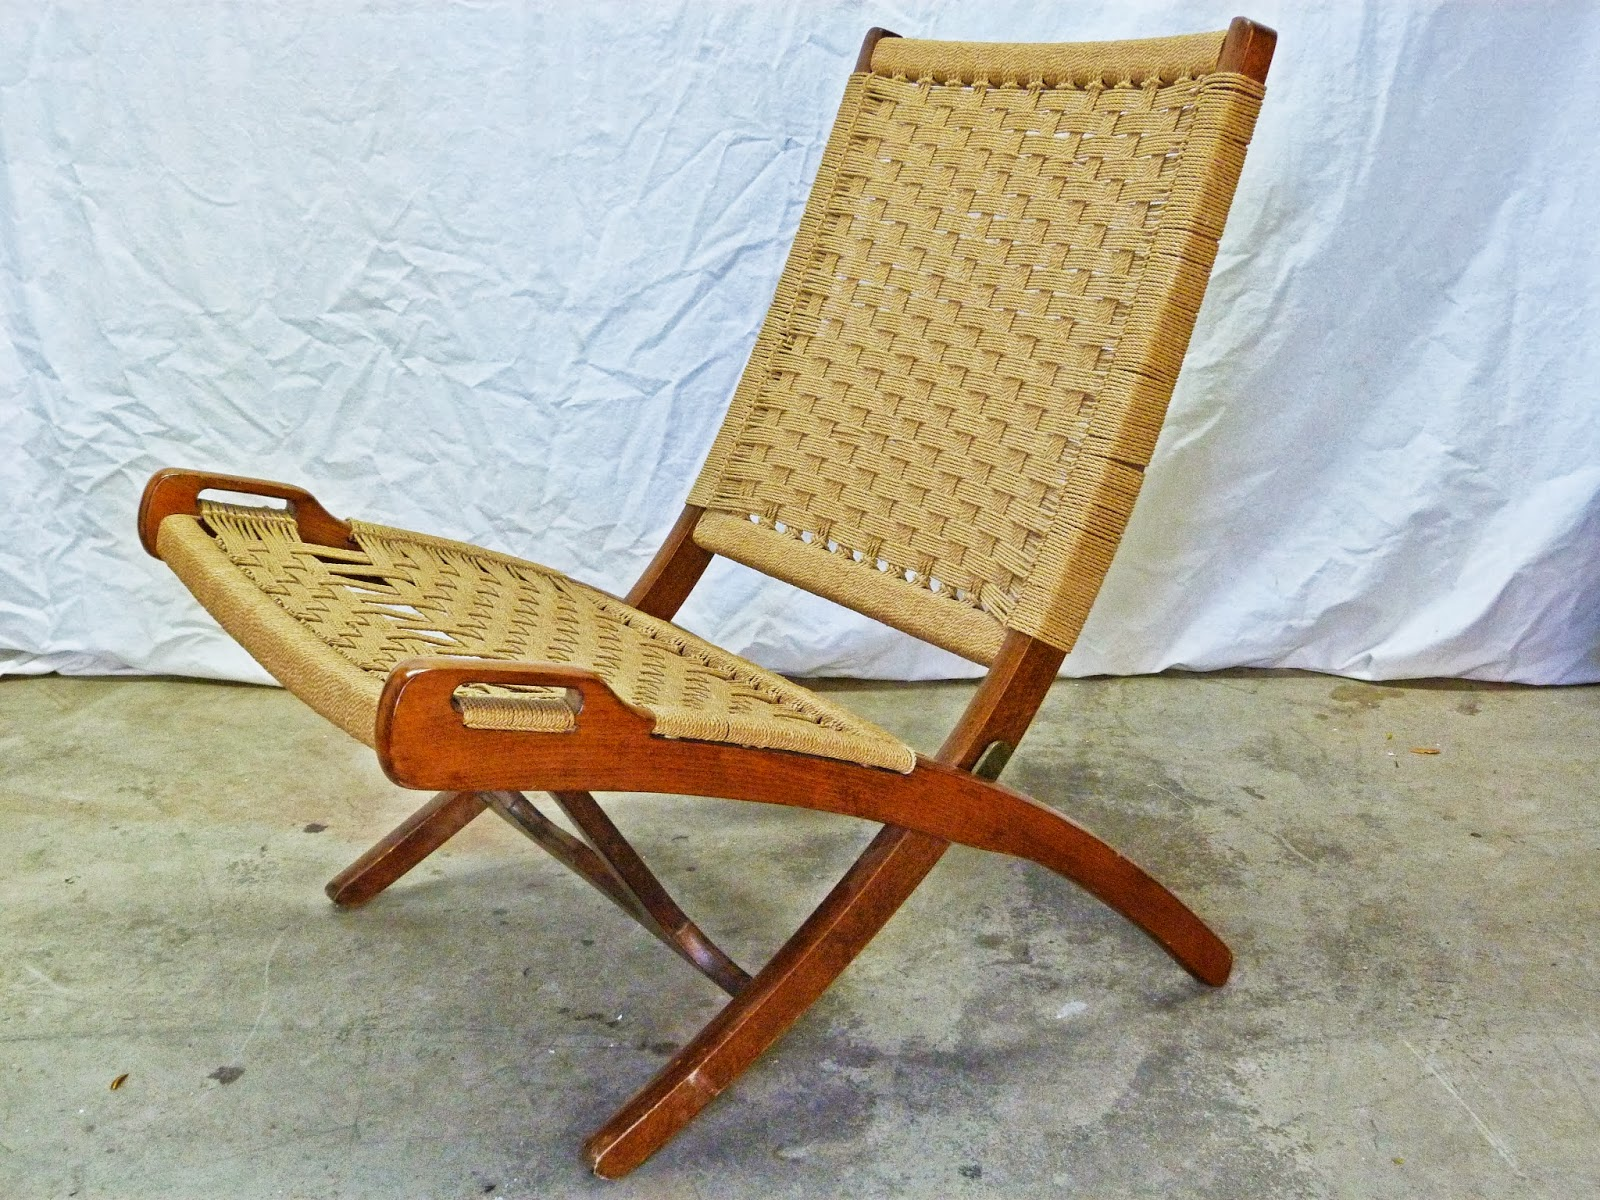 yugoslavian folding chair caravan canopy chairs modern mid century danish vintage furniture shop used